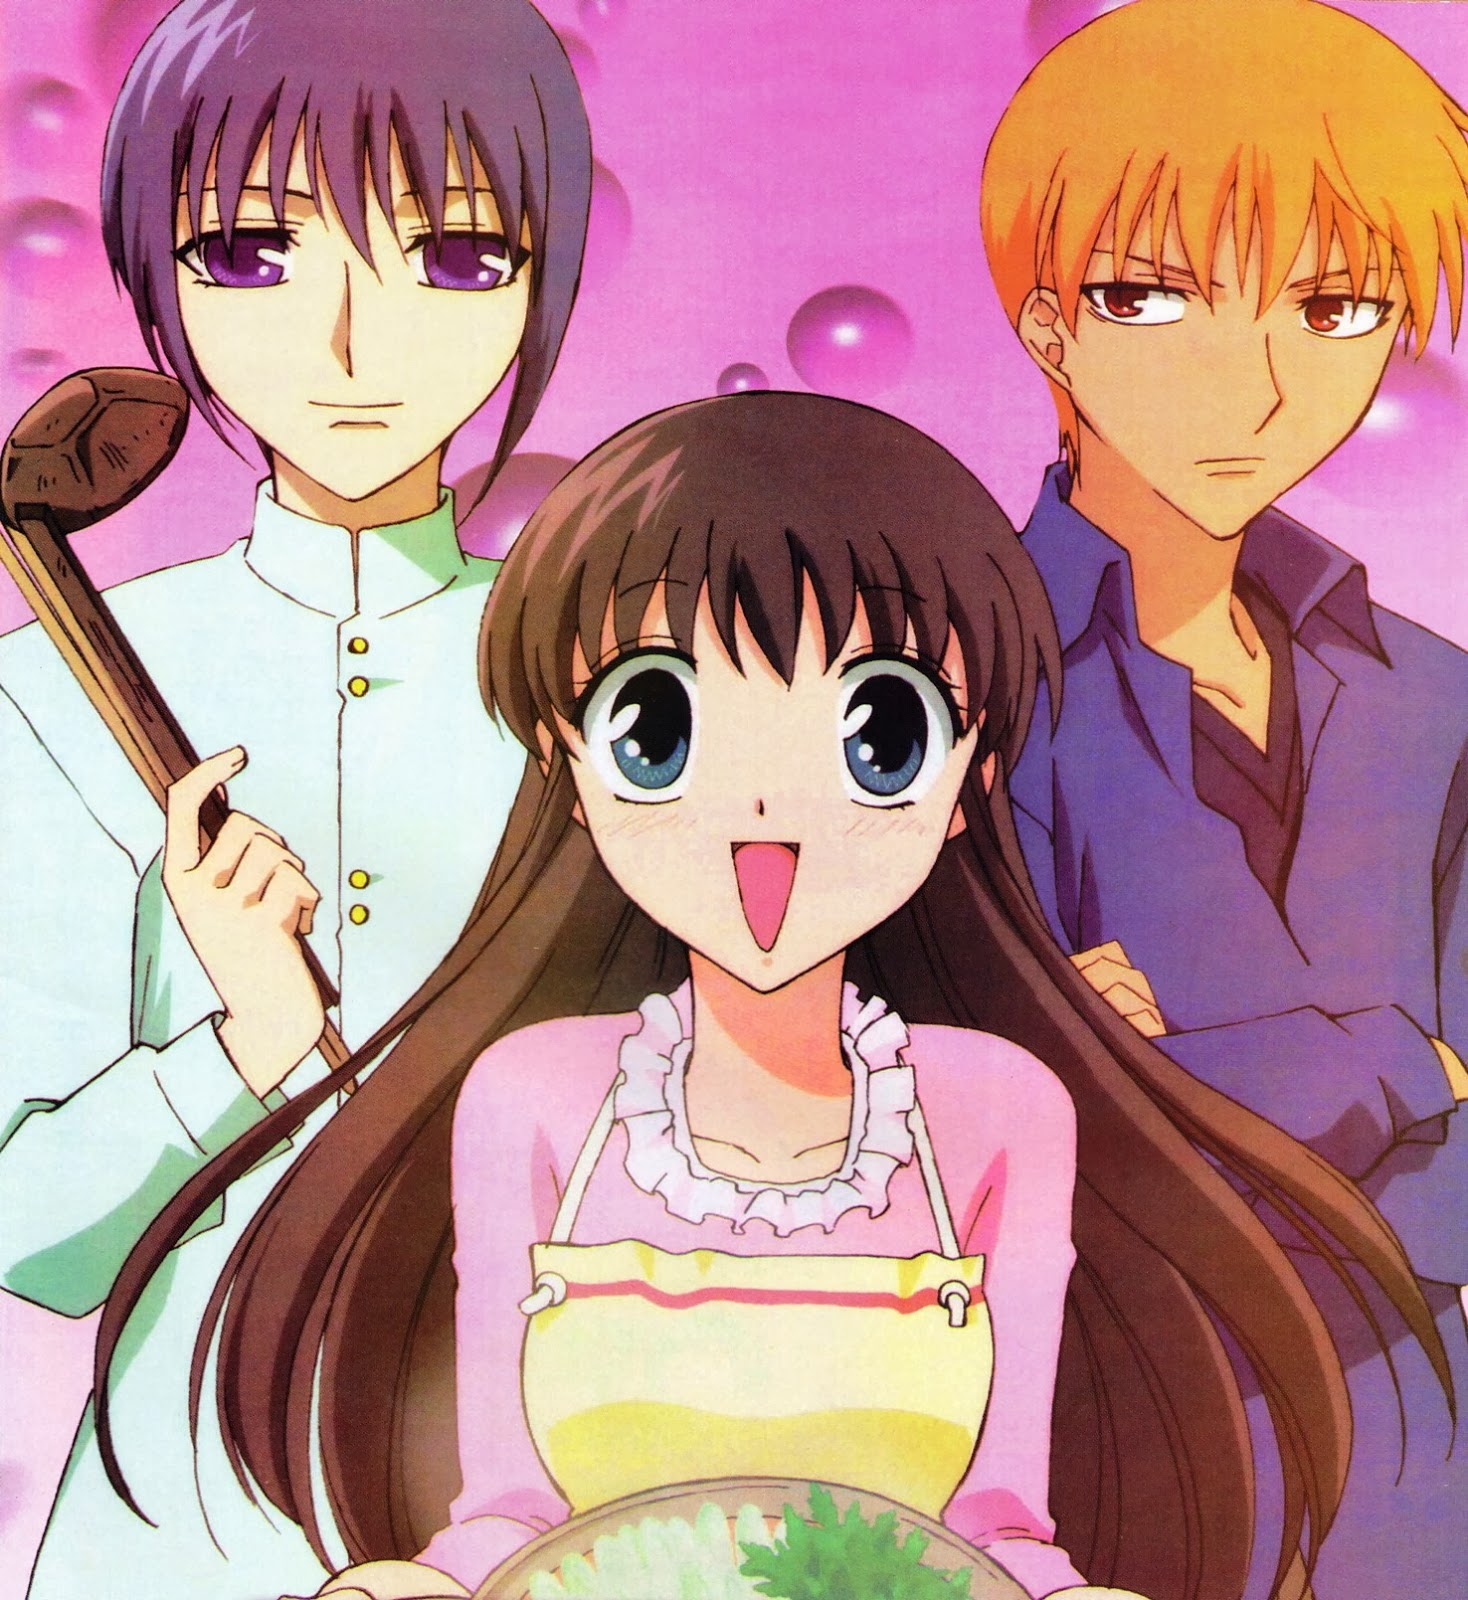 Moonlight Summoner's Anime Sekai: Fruits Basket フルーツバスケット